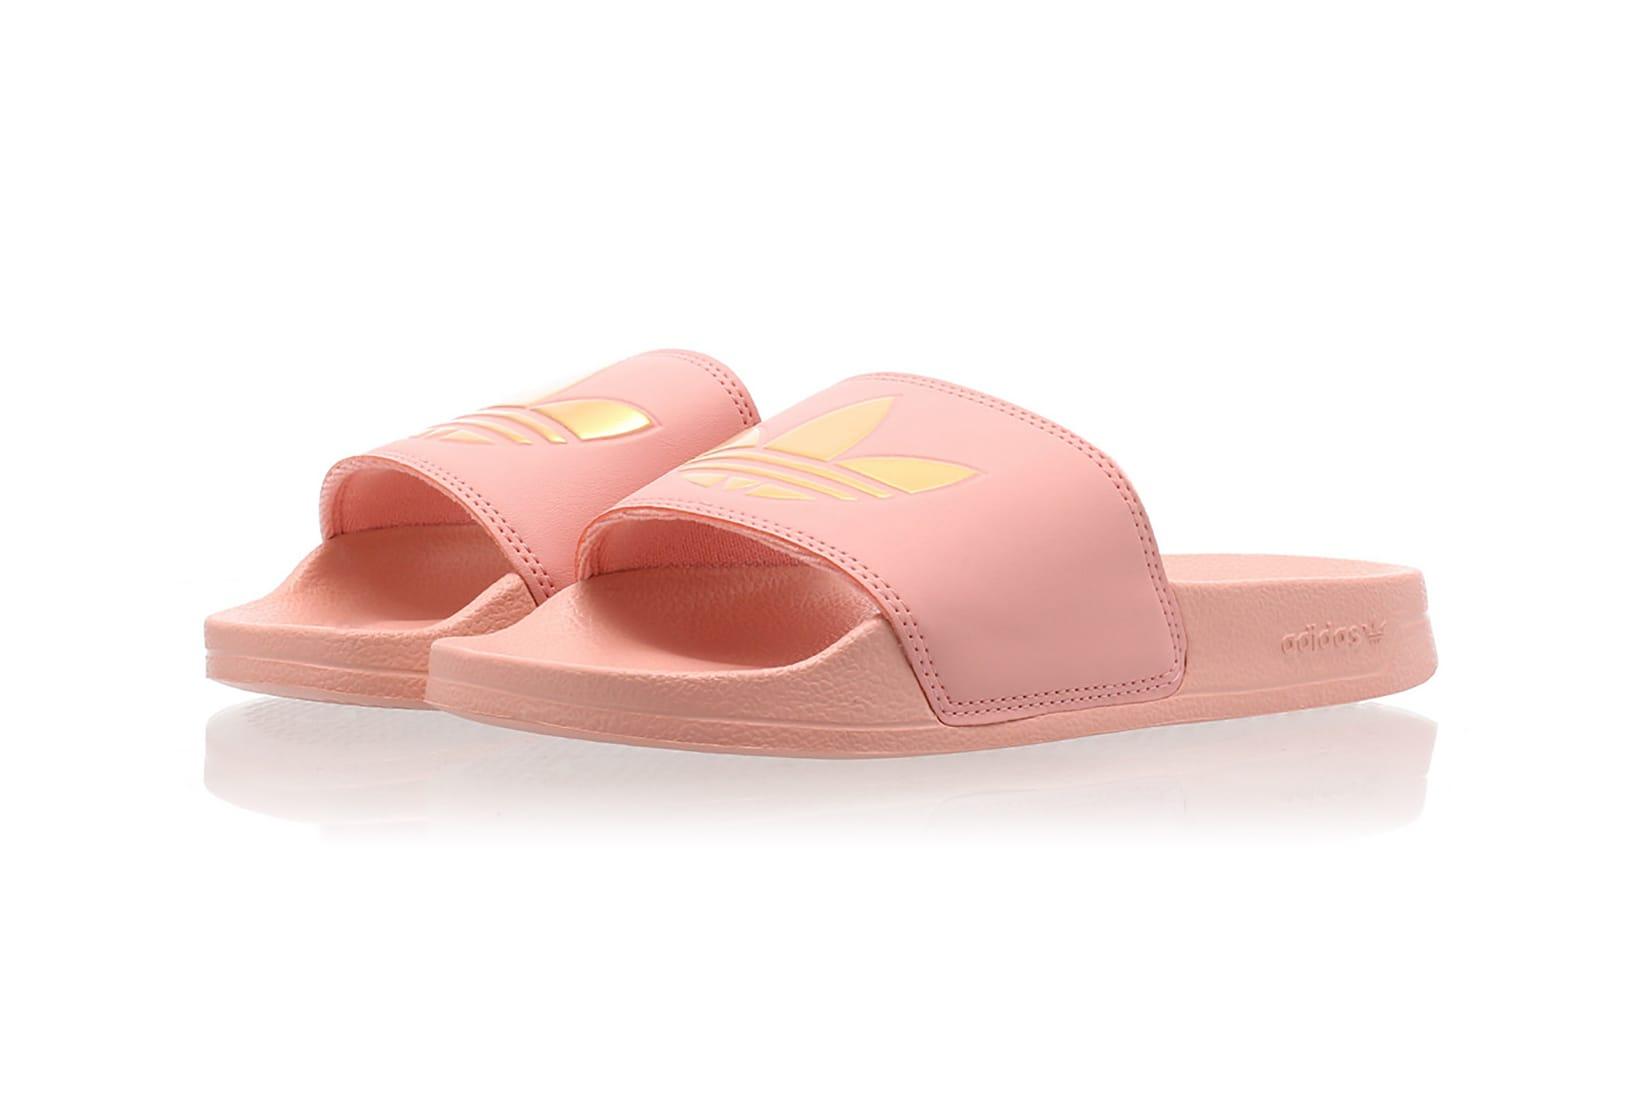 adidas adilette Lite Slides Pink/White